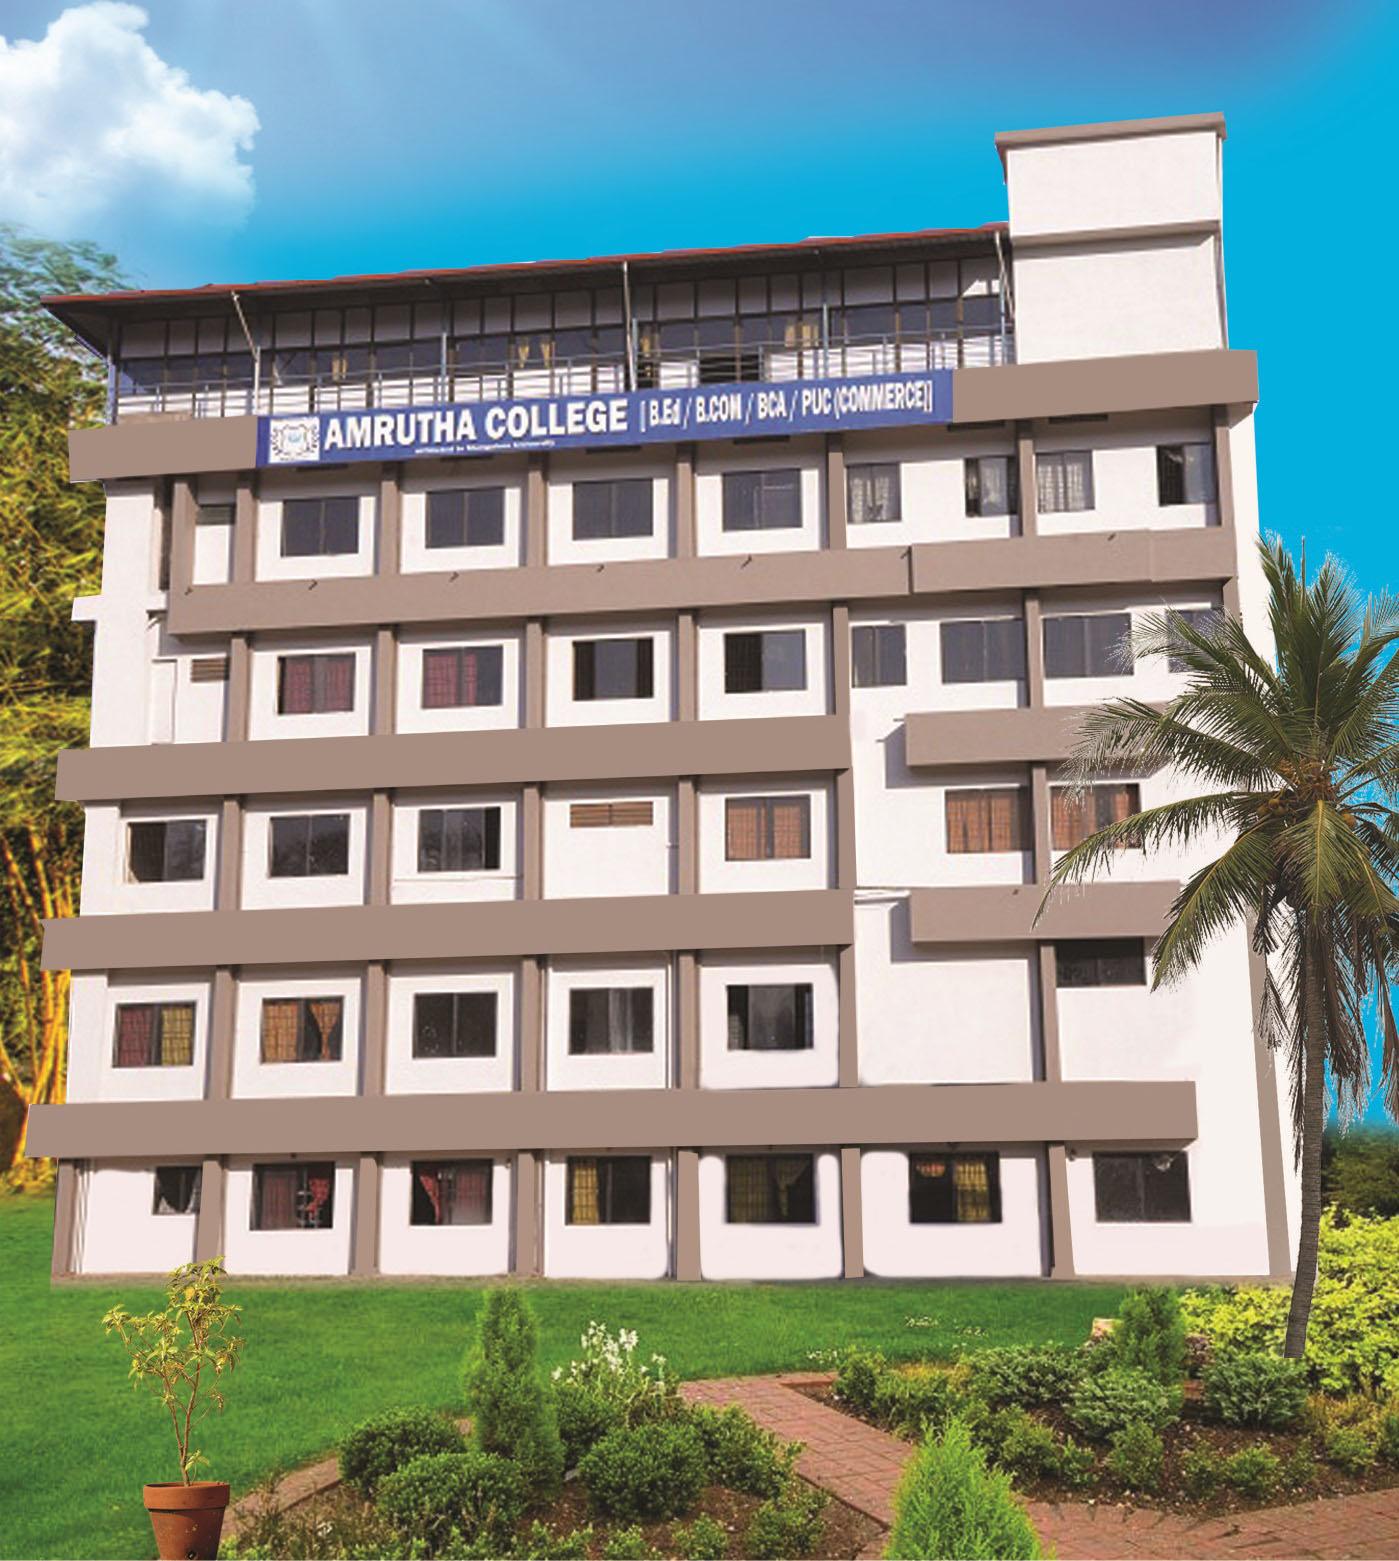 Amrutha College, Mangalore